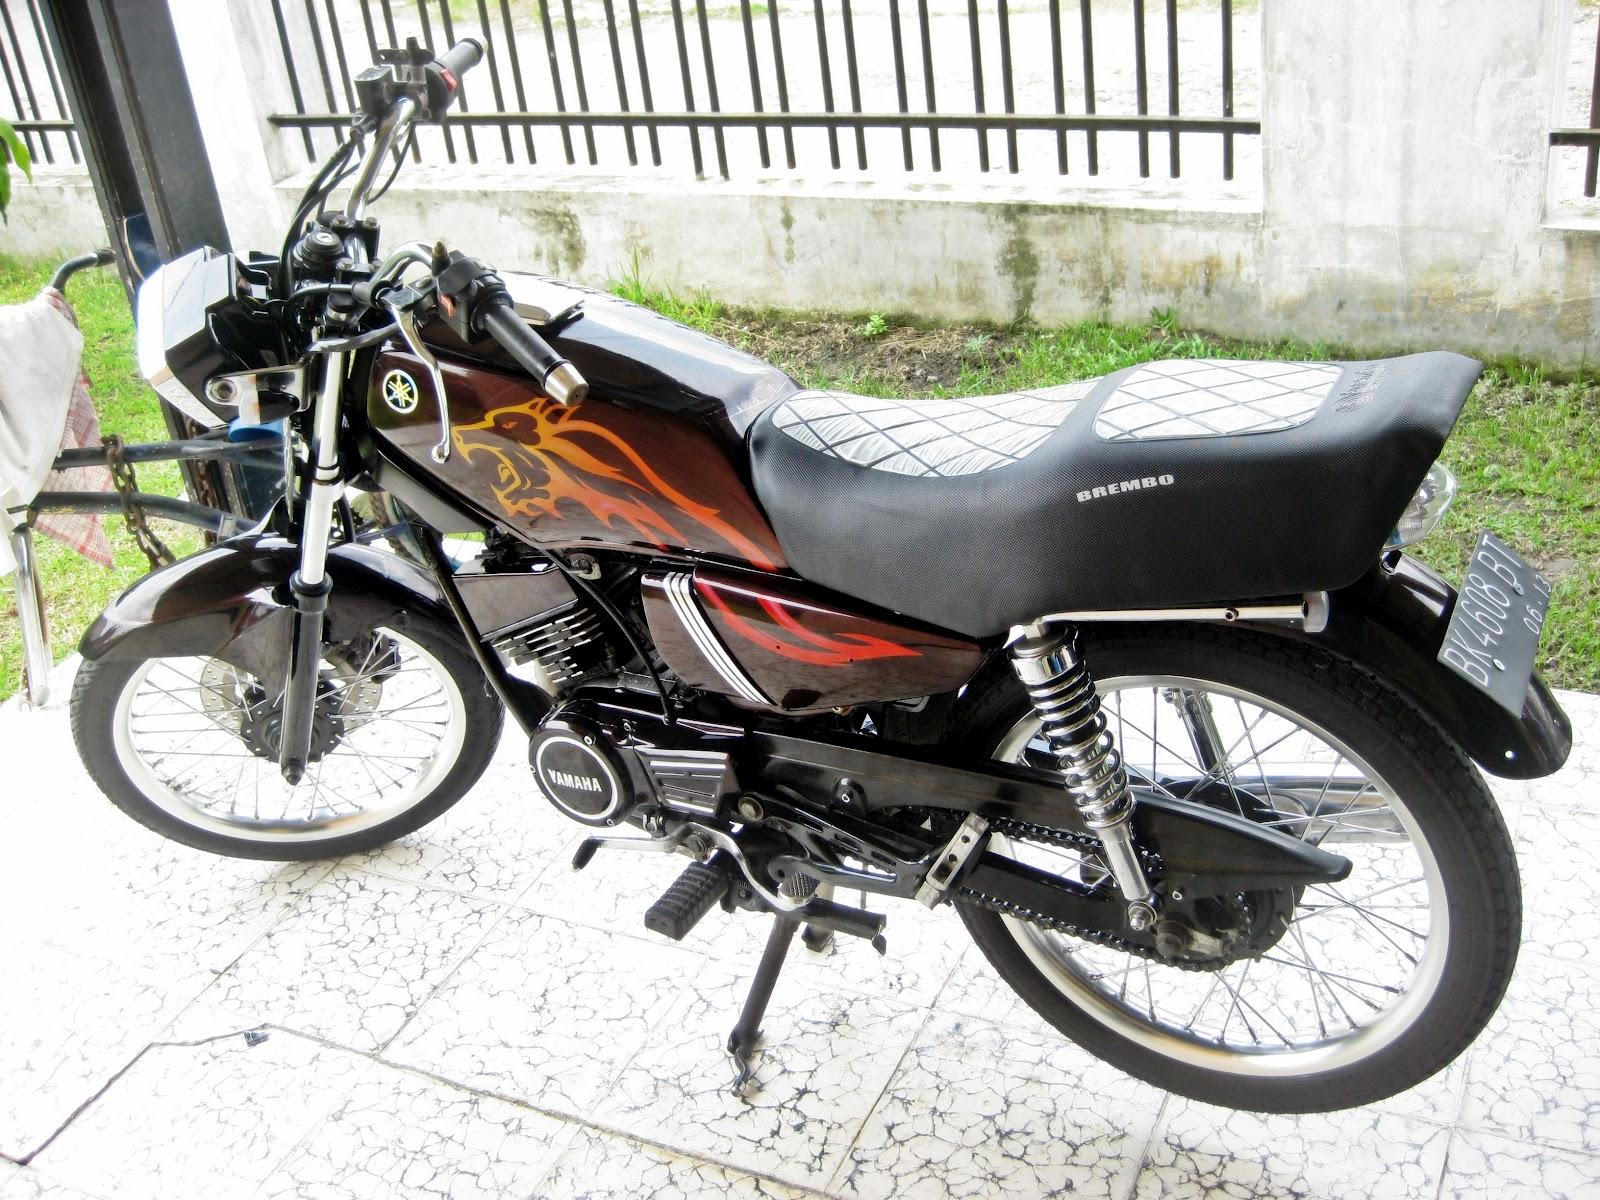 Modifikasi Sepeda Motor Yamaha Rx King